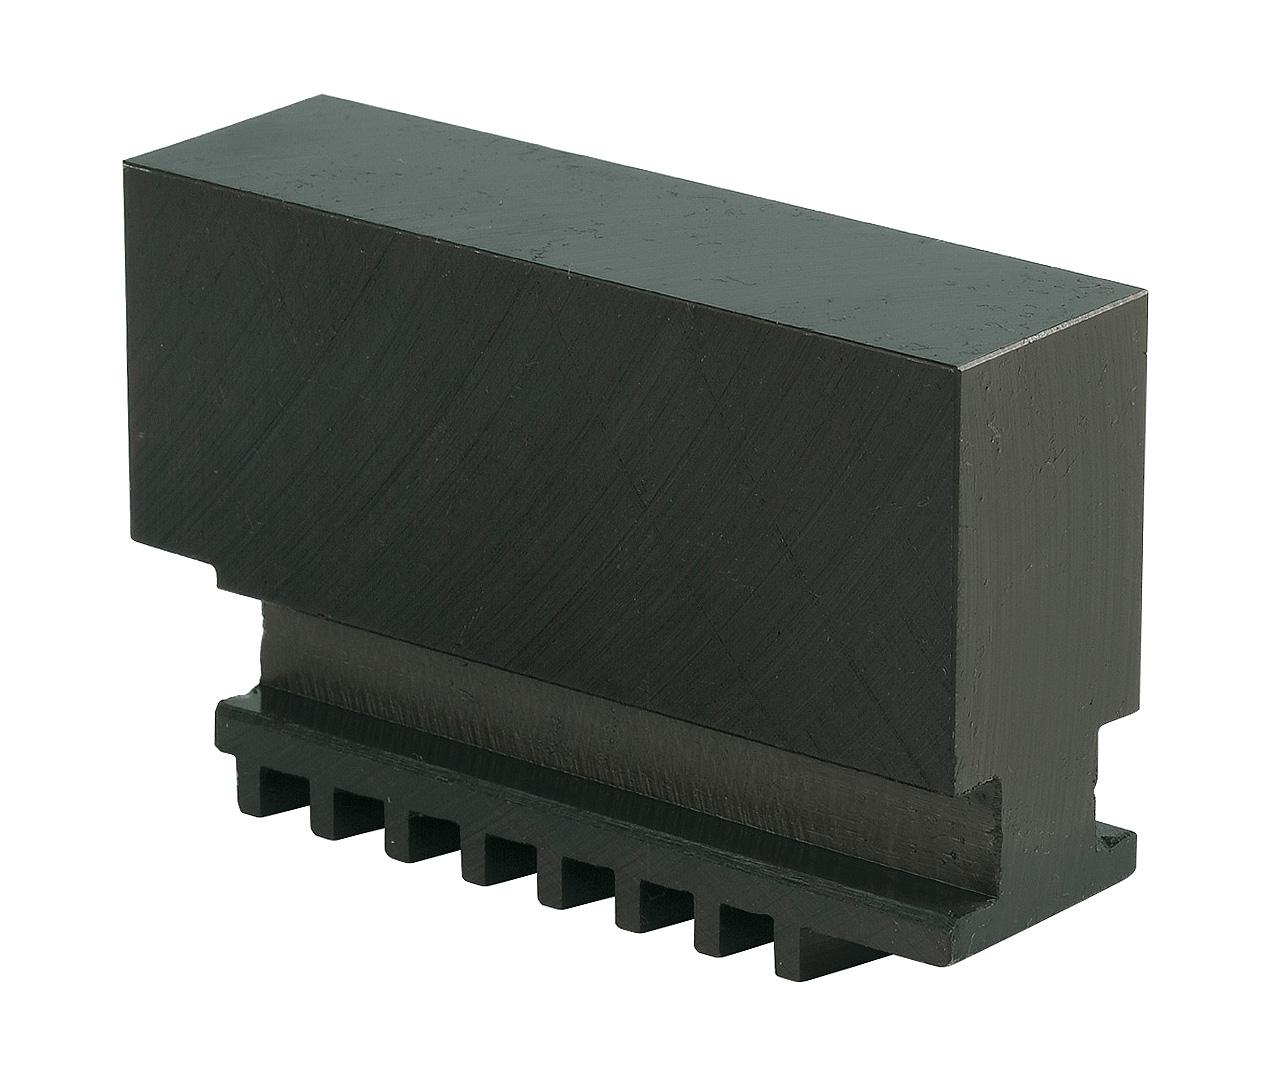 Szczęki jednolite miękkie - komplet SJ-PS4-315 BERNARDO